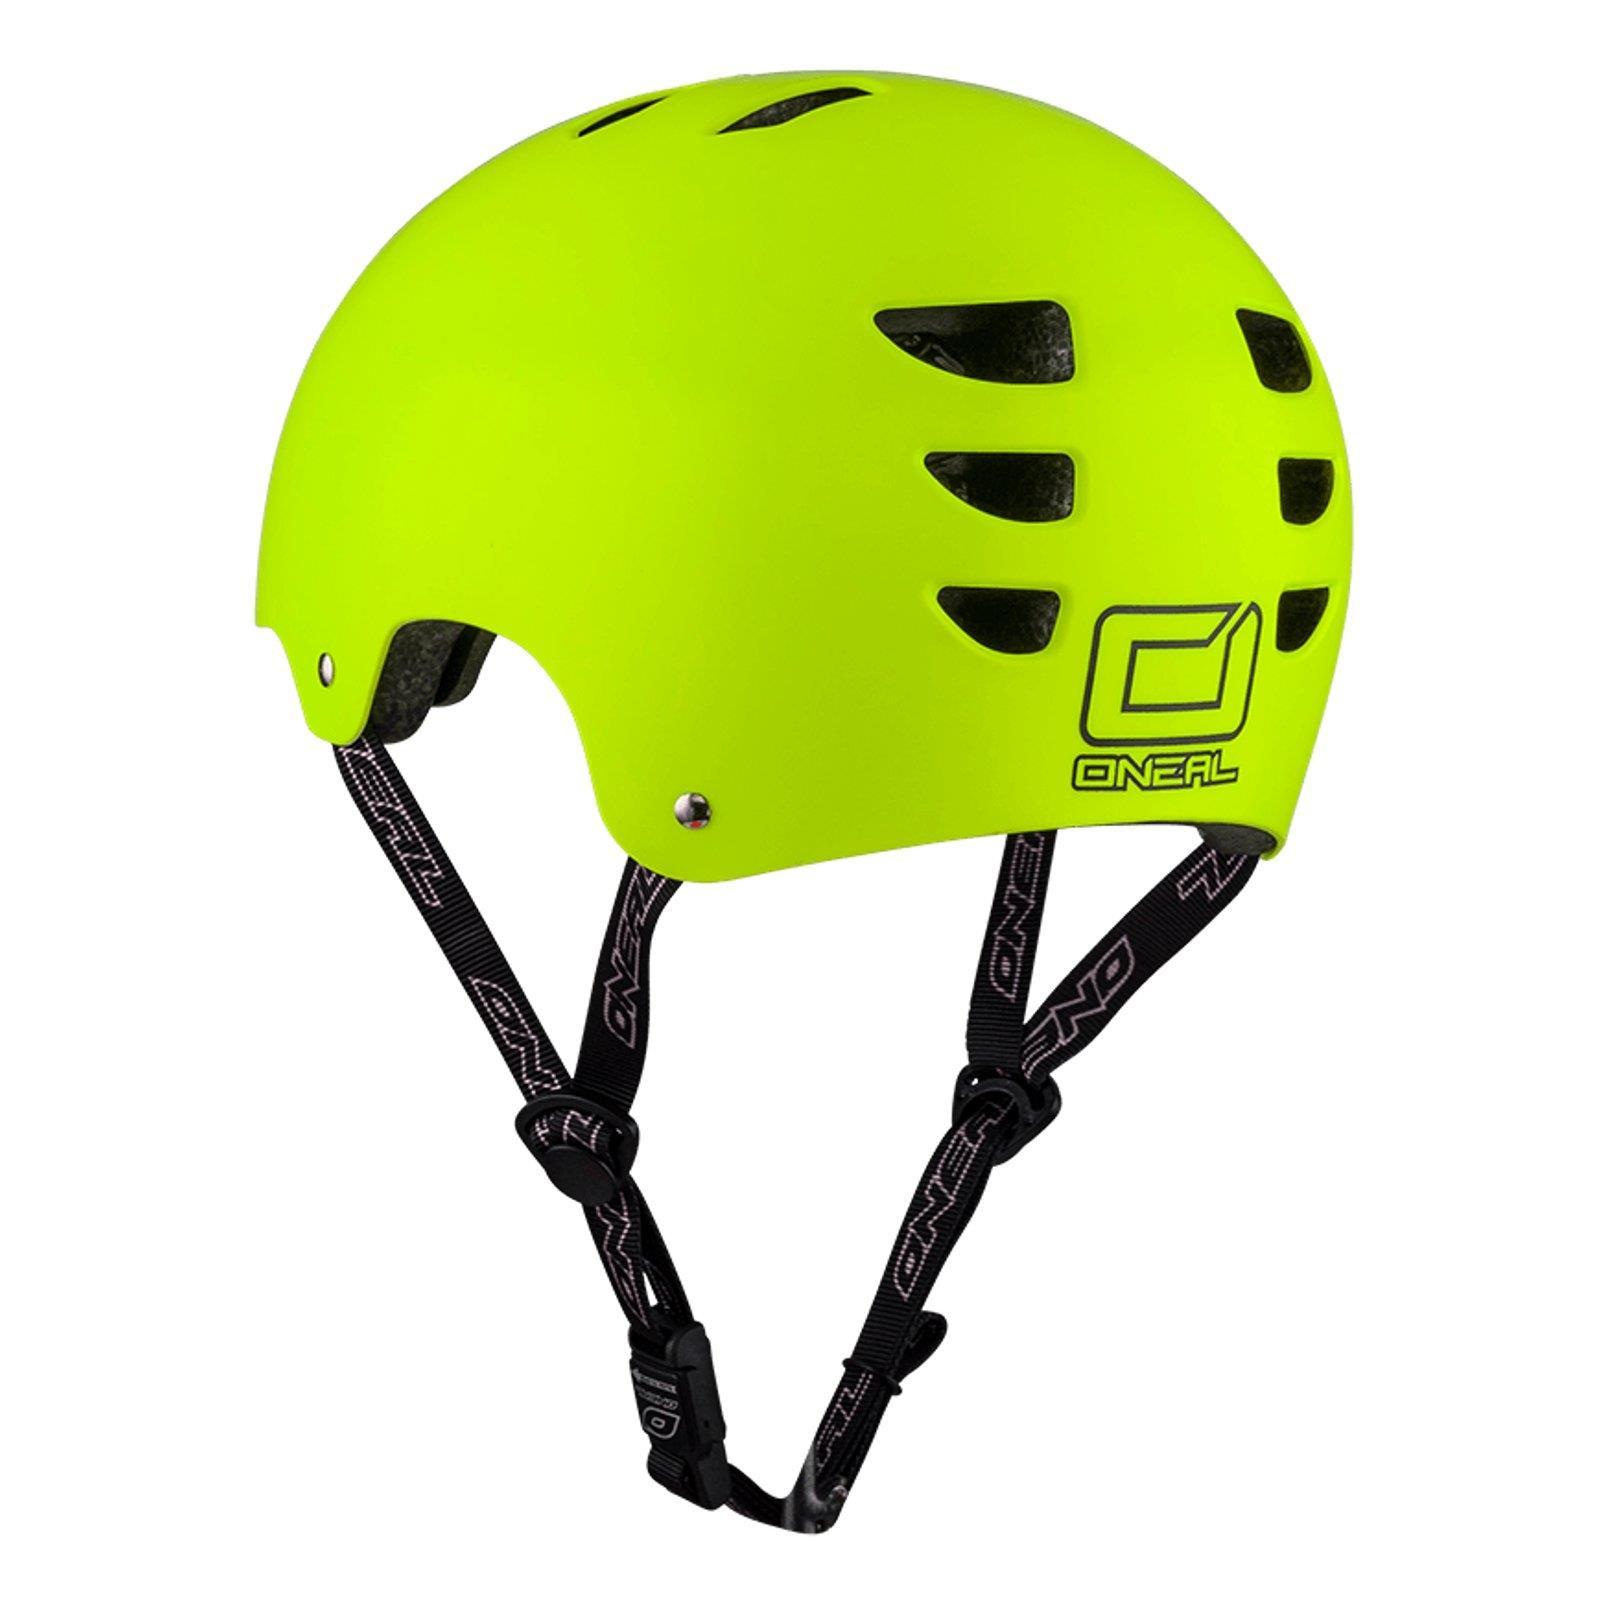 O'Neal Dirt Lid Lid Lid Fidlock ProFit Helm MATT NEON Gelb BMX MTB Skate Fahrrad Magnet 831217